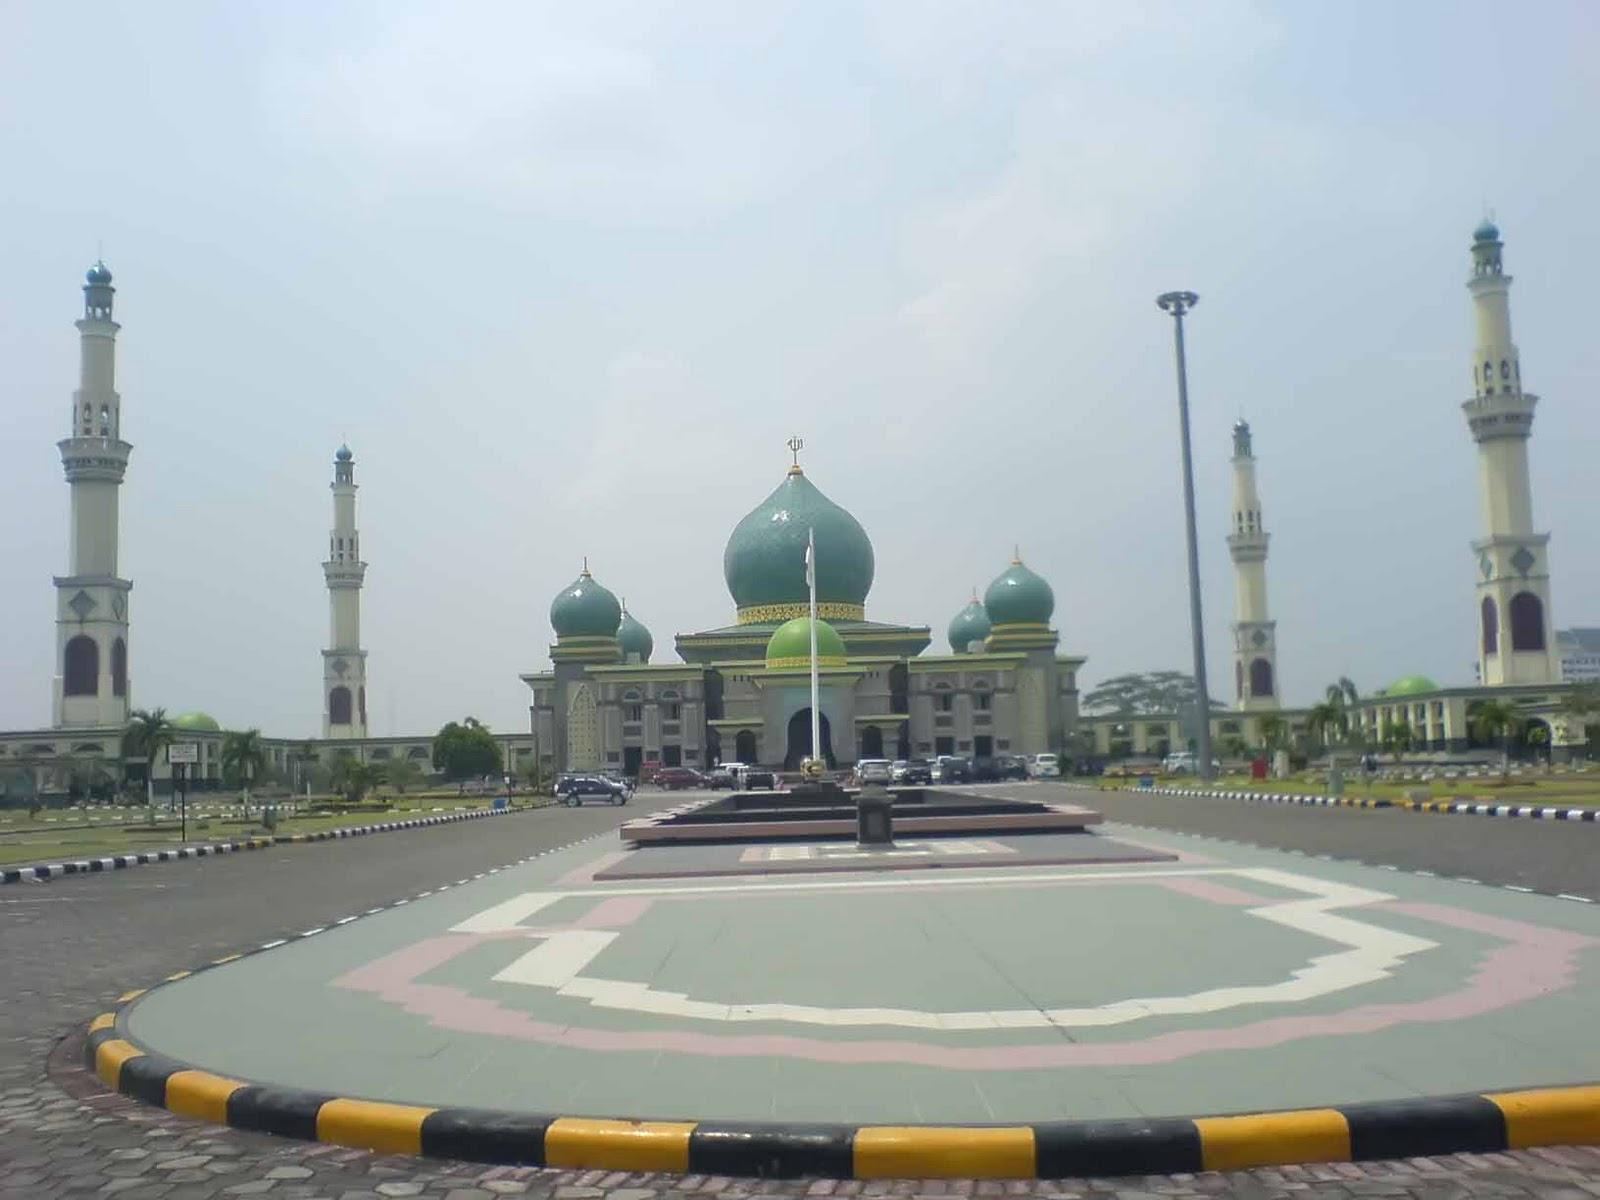 Masjid Agung Annur Kota Pekanbaru Riau Blognya Adhitya P Nur